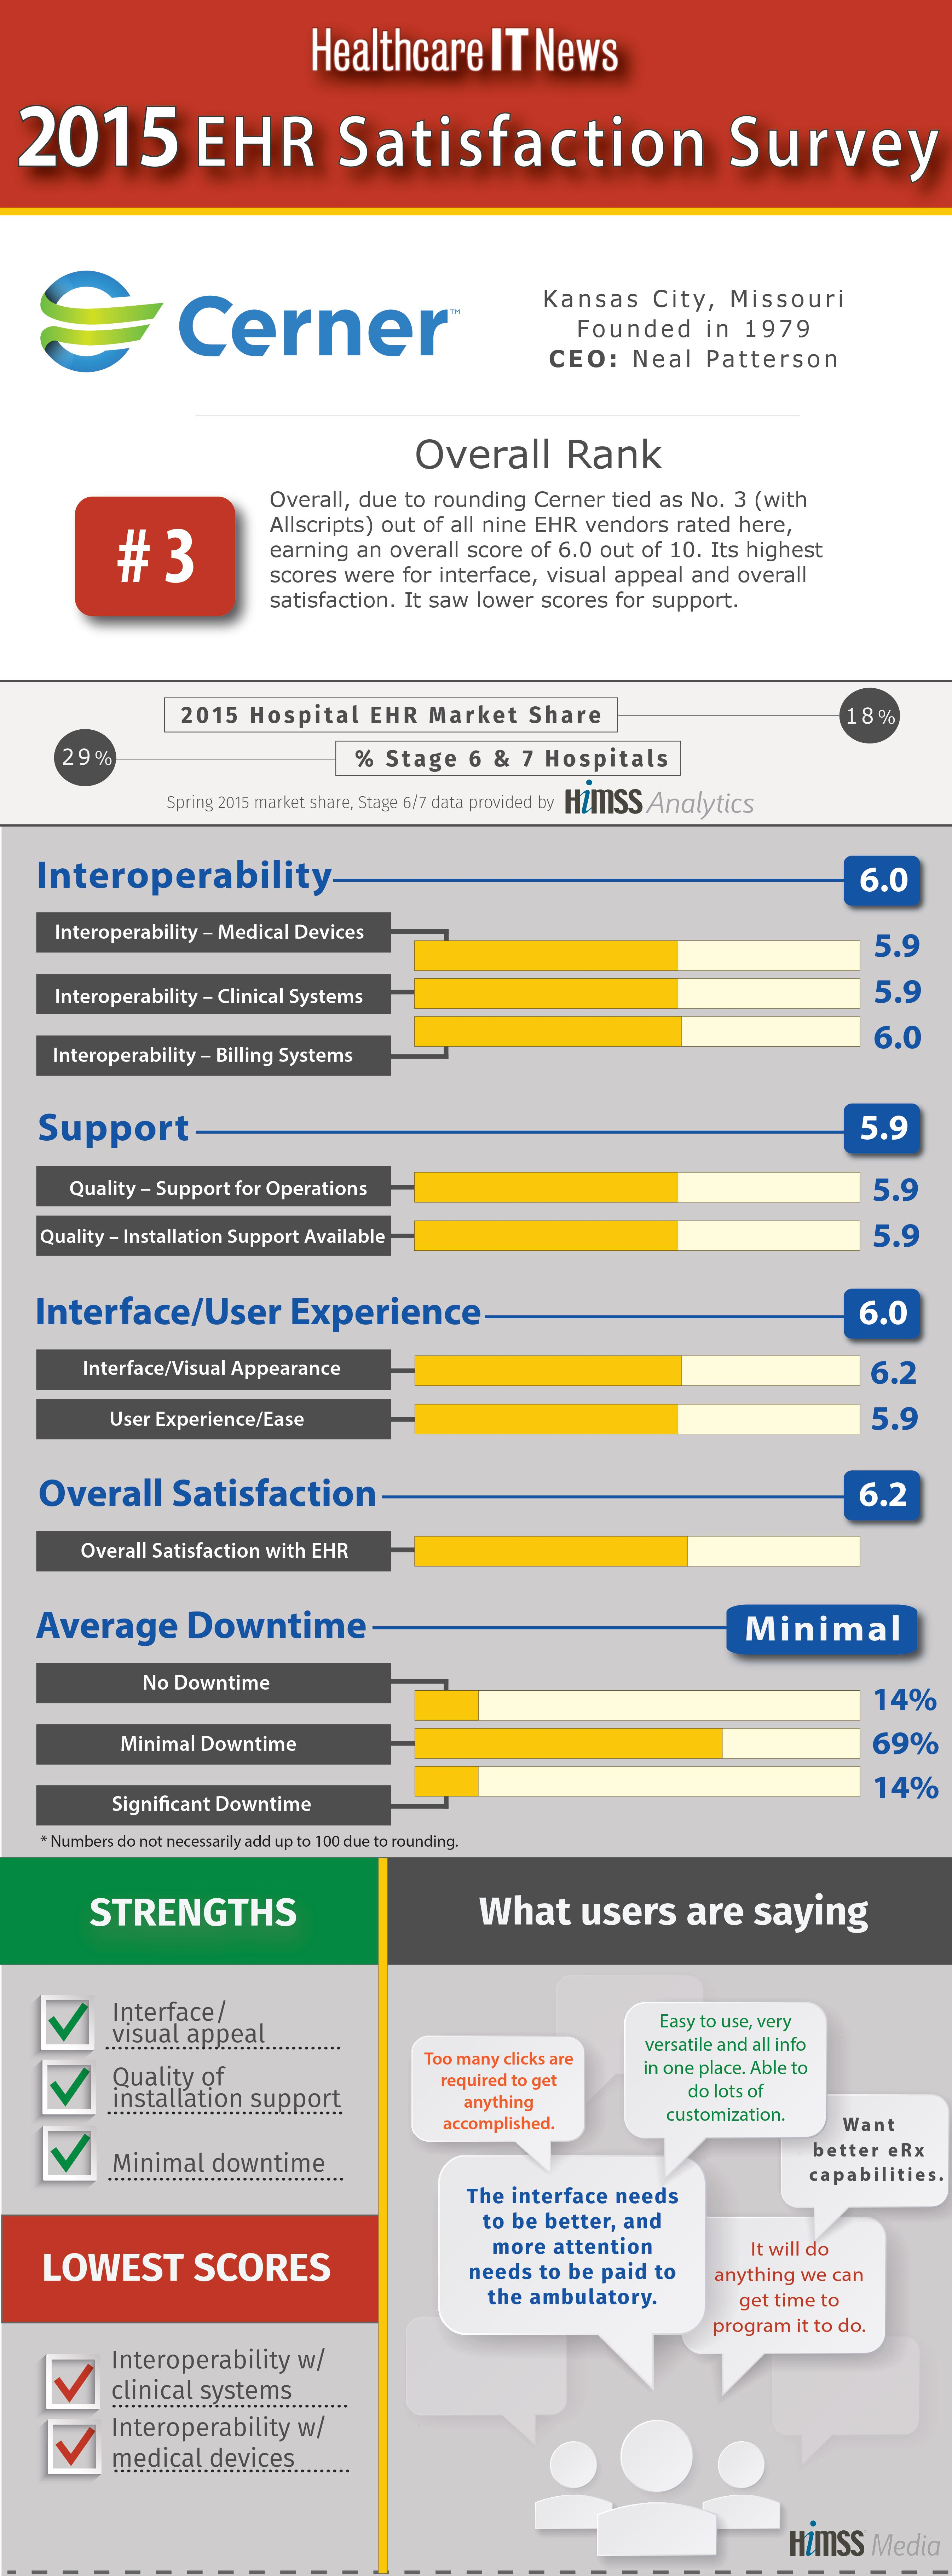 2015 Ehr Satisfaction Survey Vendor Report Card Cerner